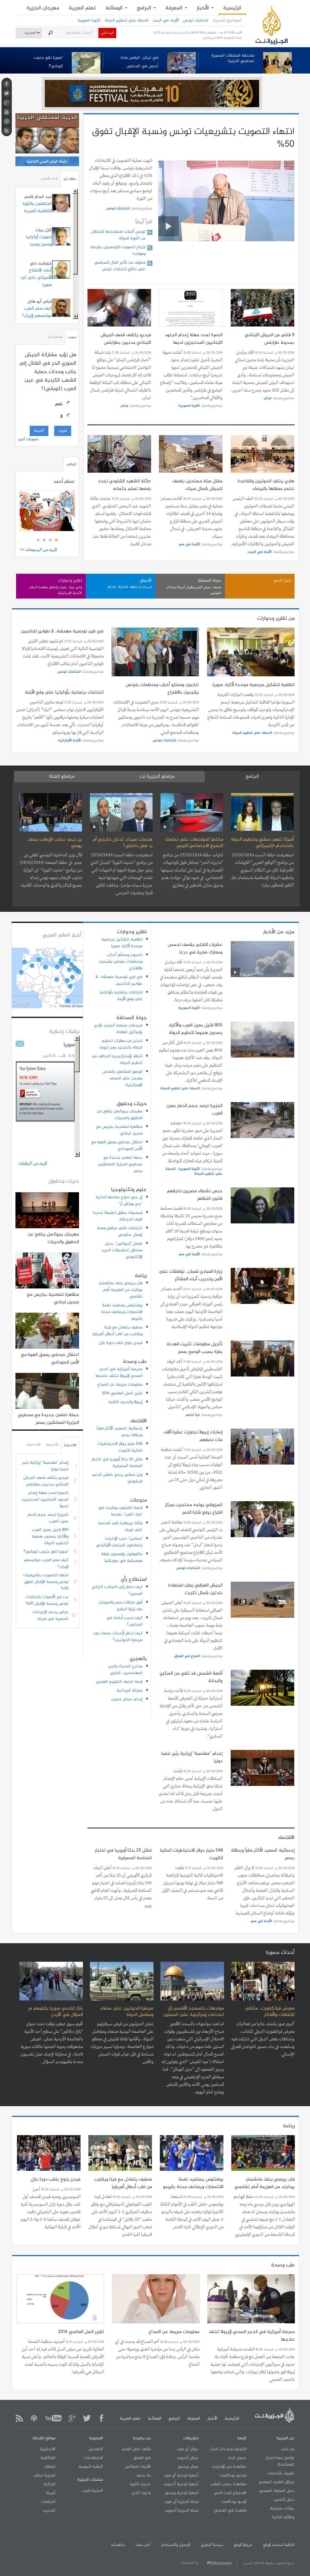 Al Jazeera at Sunday Oct. 26, 2014, 8:07 p.m. UTC